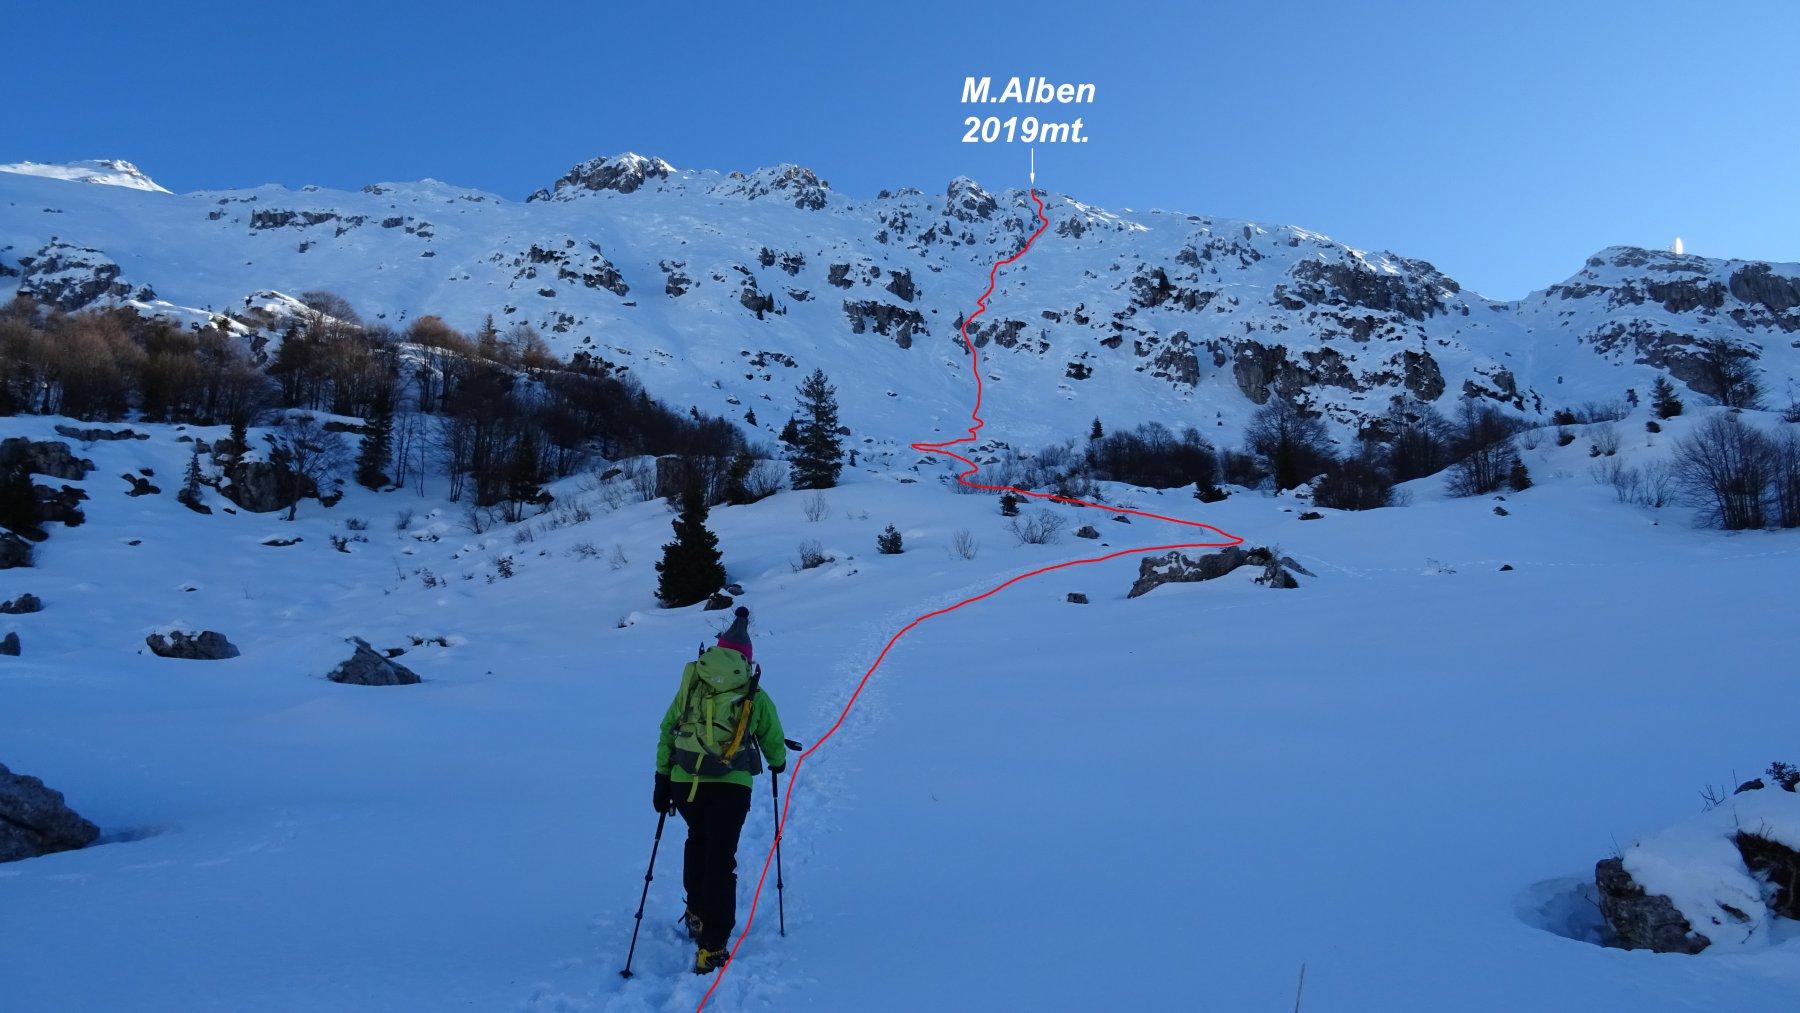 Alben (Monte) Canale Ilaria 2019-12-30